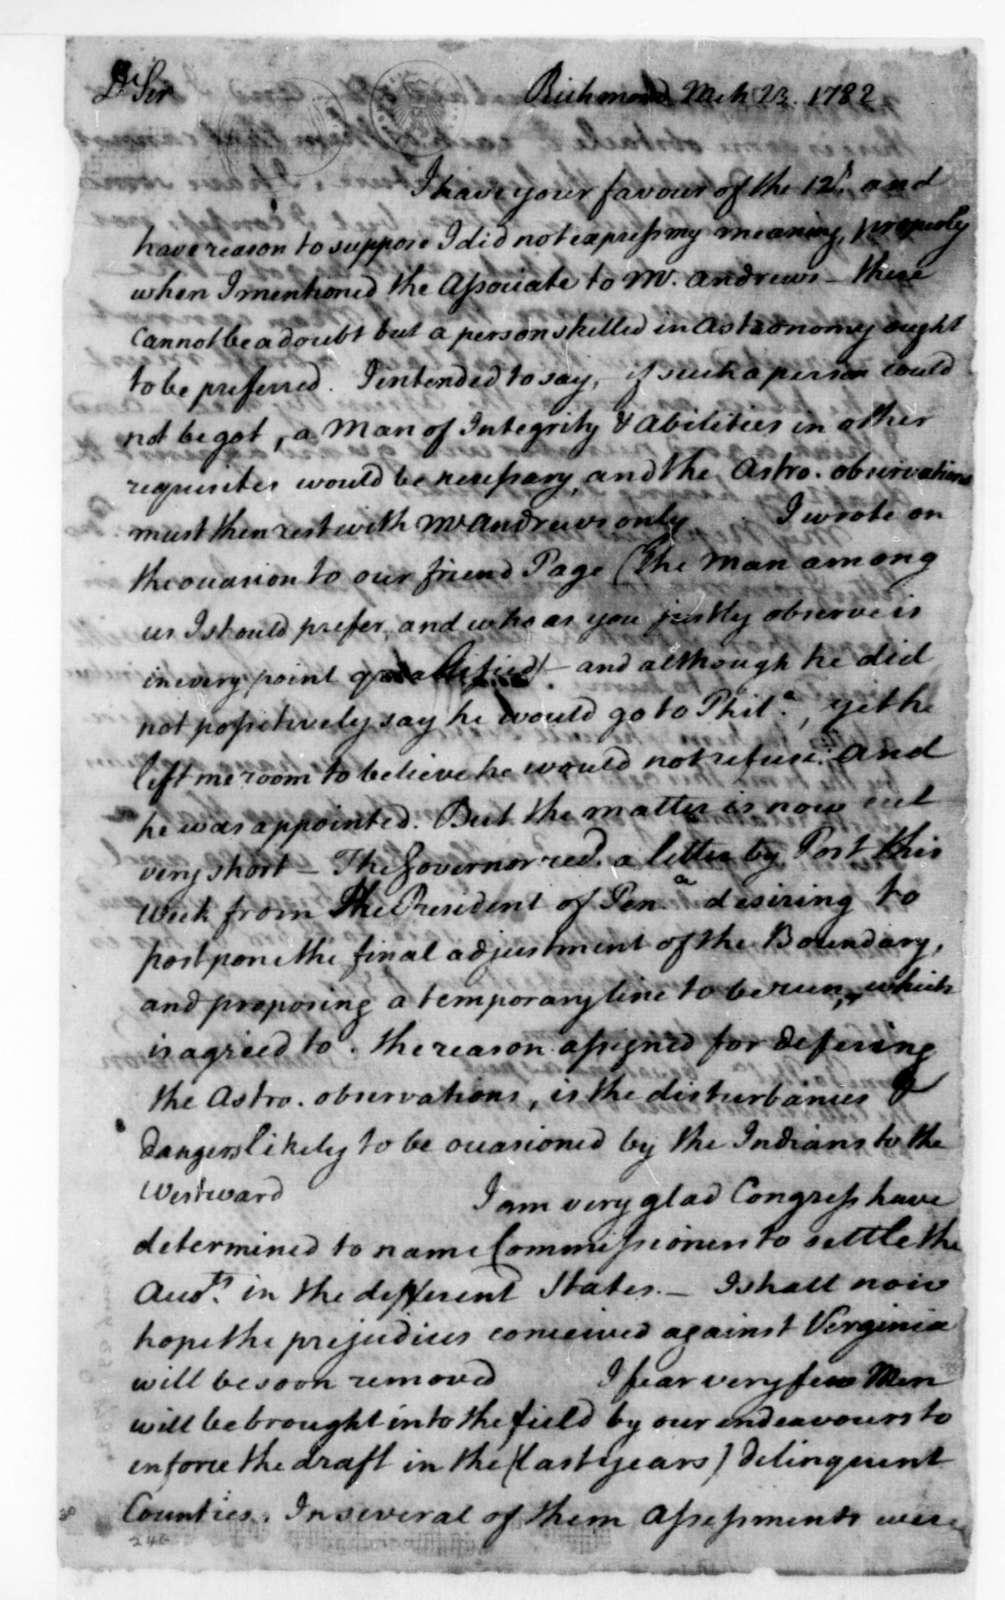 David Jameson to James Madison, March 23, 1782.